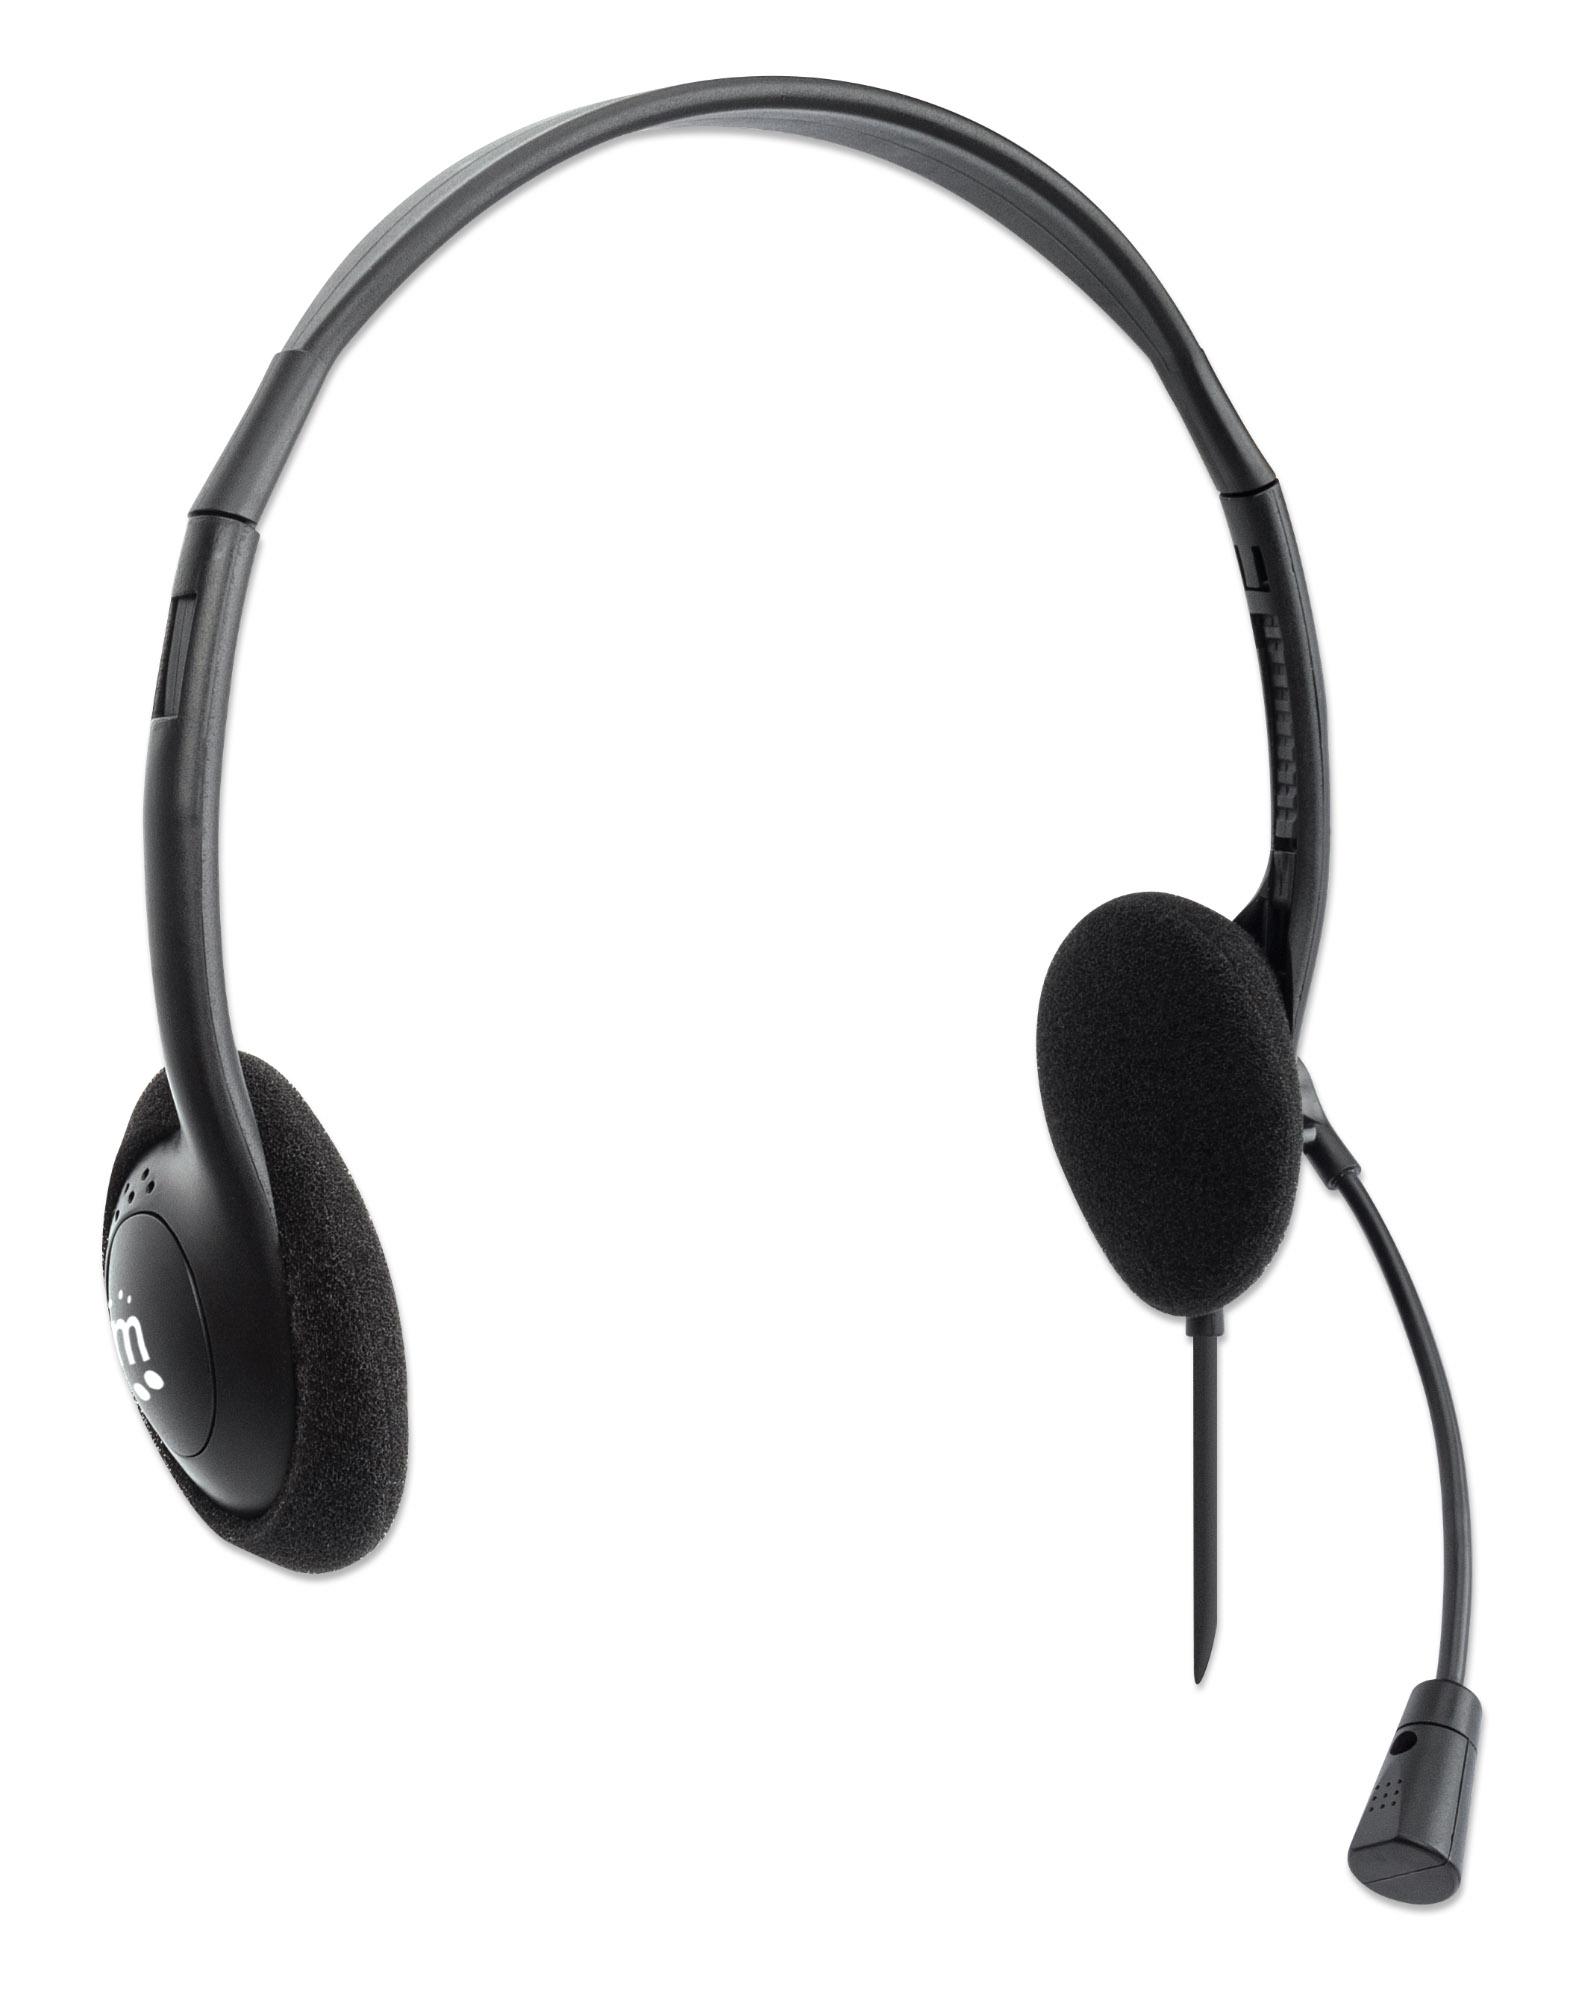 Stereo USB Headset